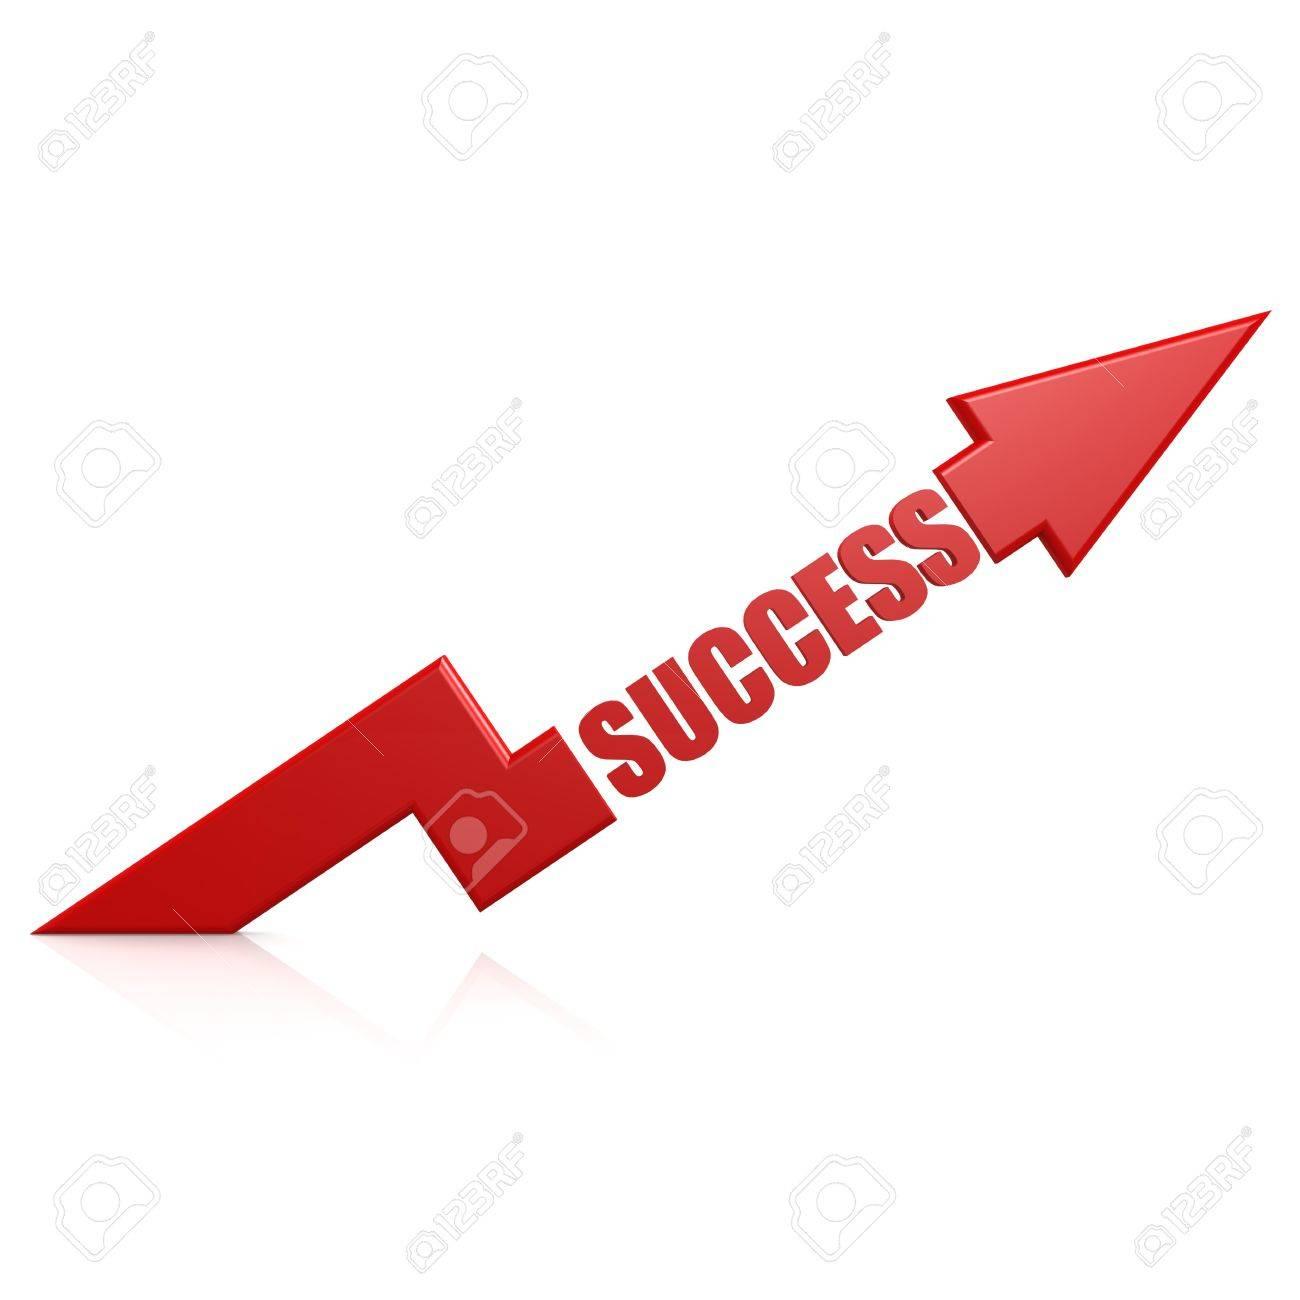 Success arrow up red - 25851992